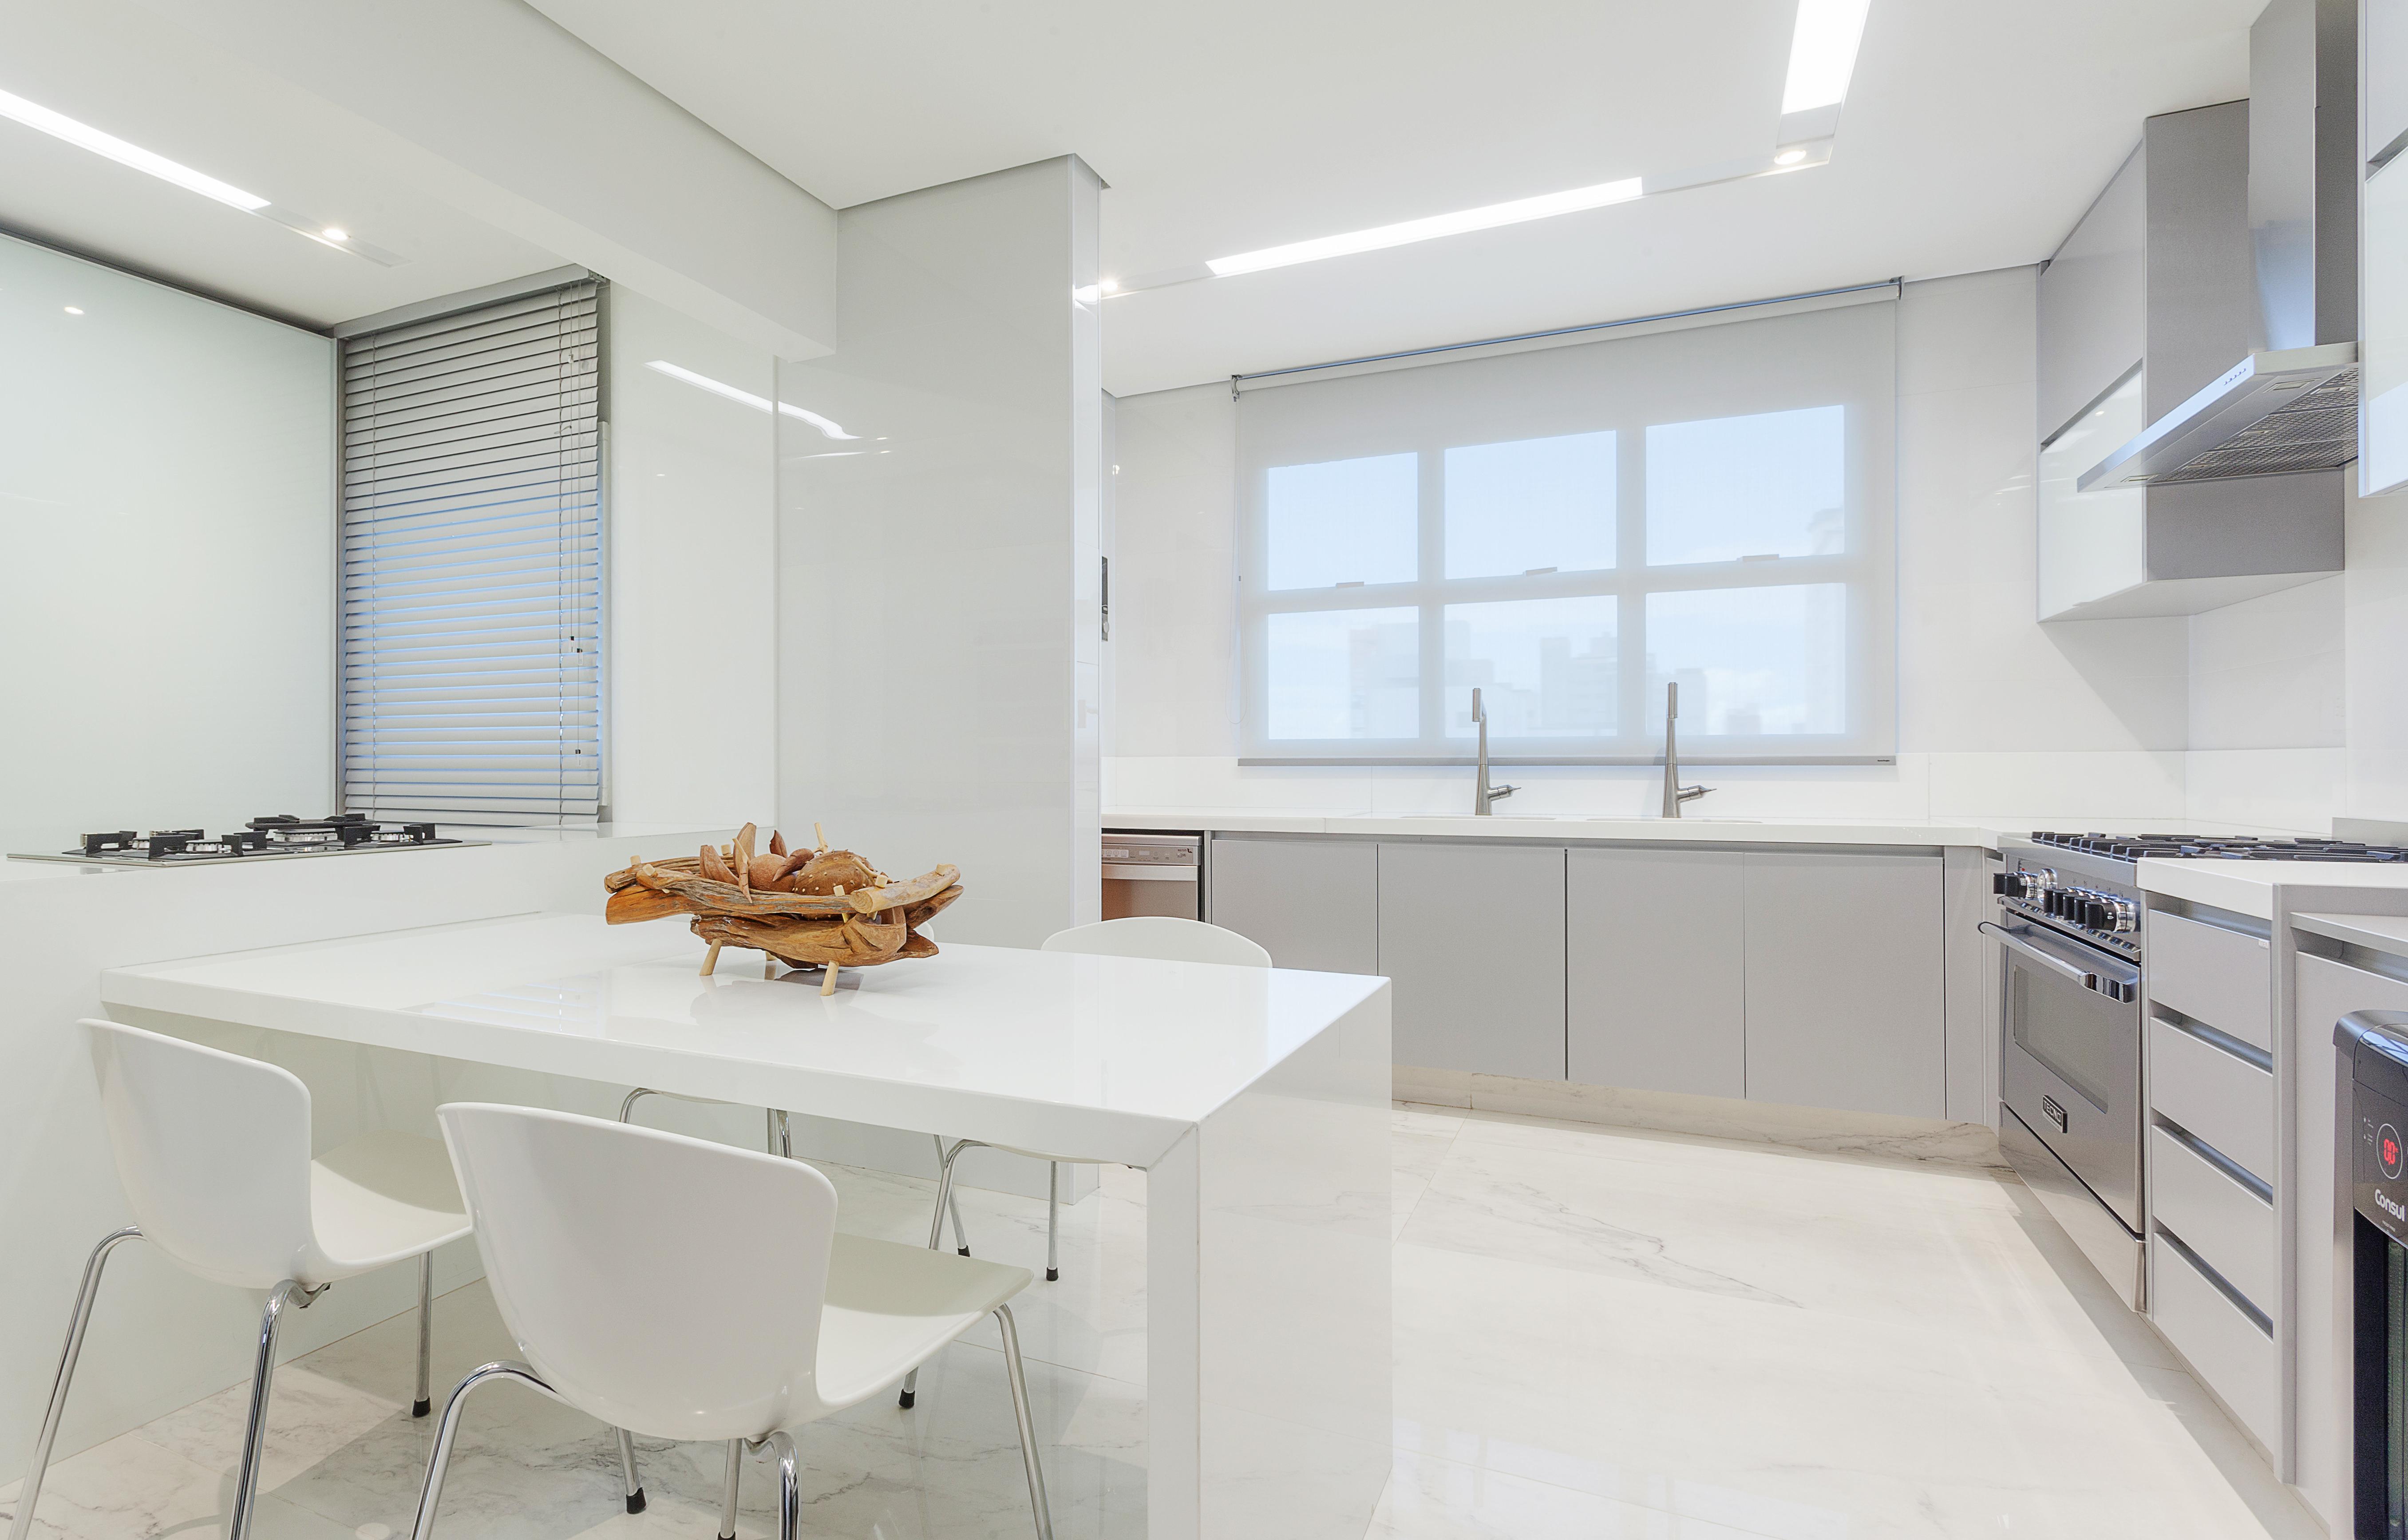 Situar-Projetos-RL-Kit-pg-c